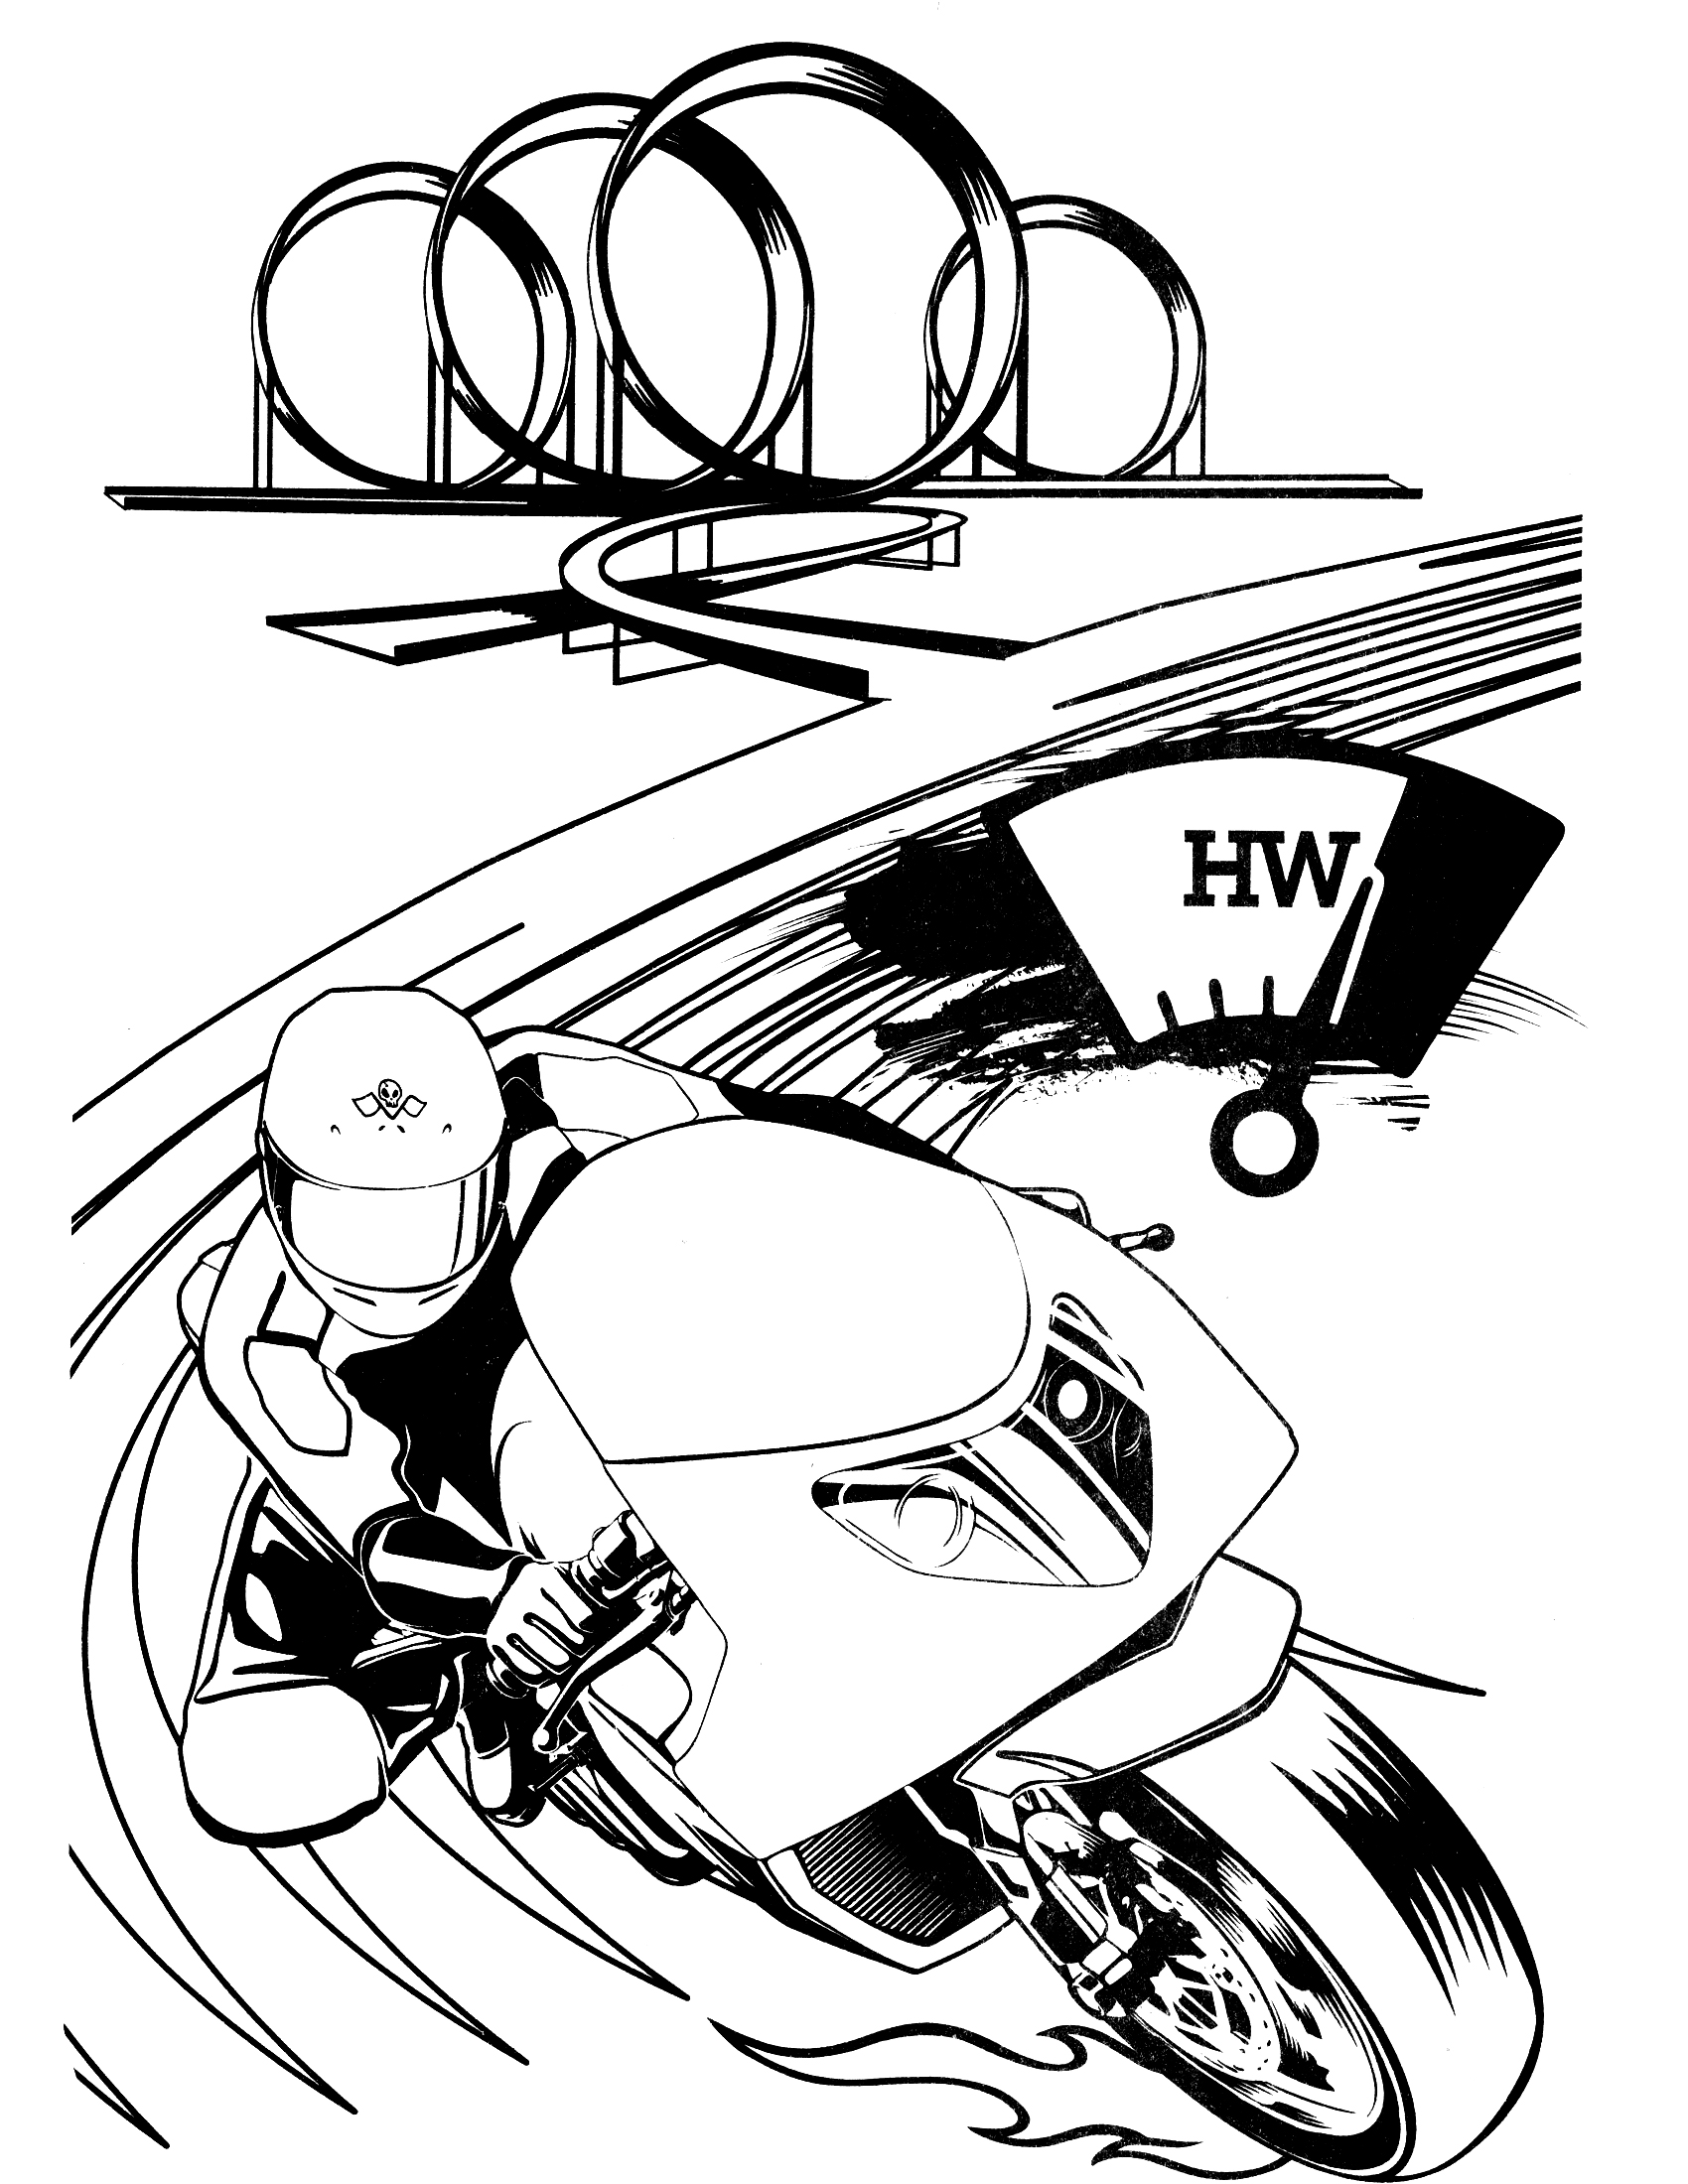 Hot Wheels clipart hot whee Hot Cliparts Wheel Cliparts Clipart